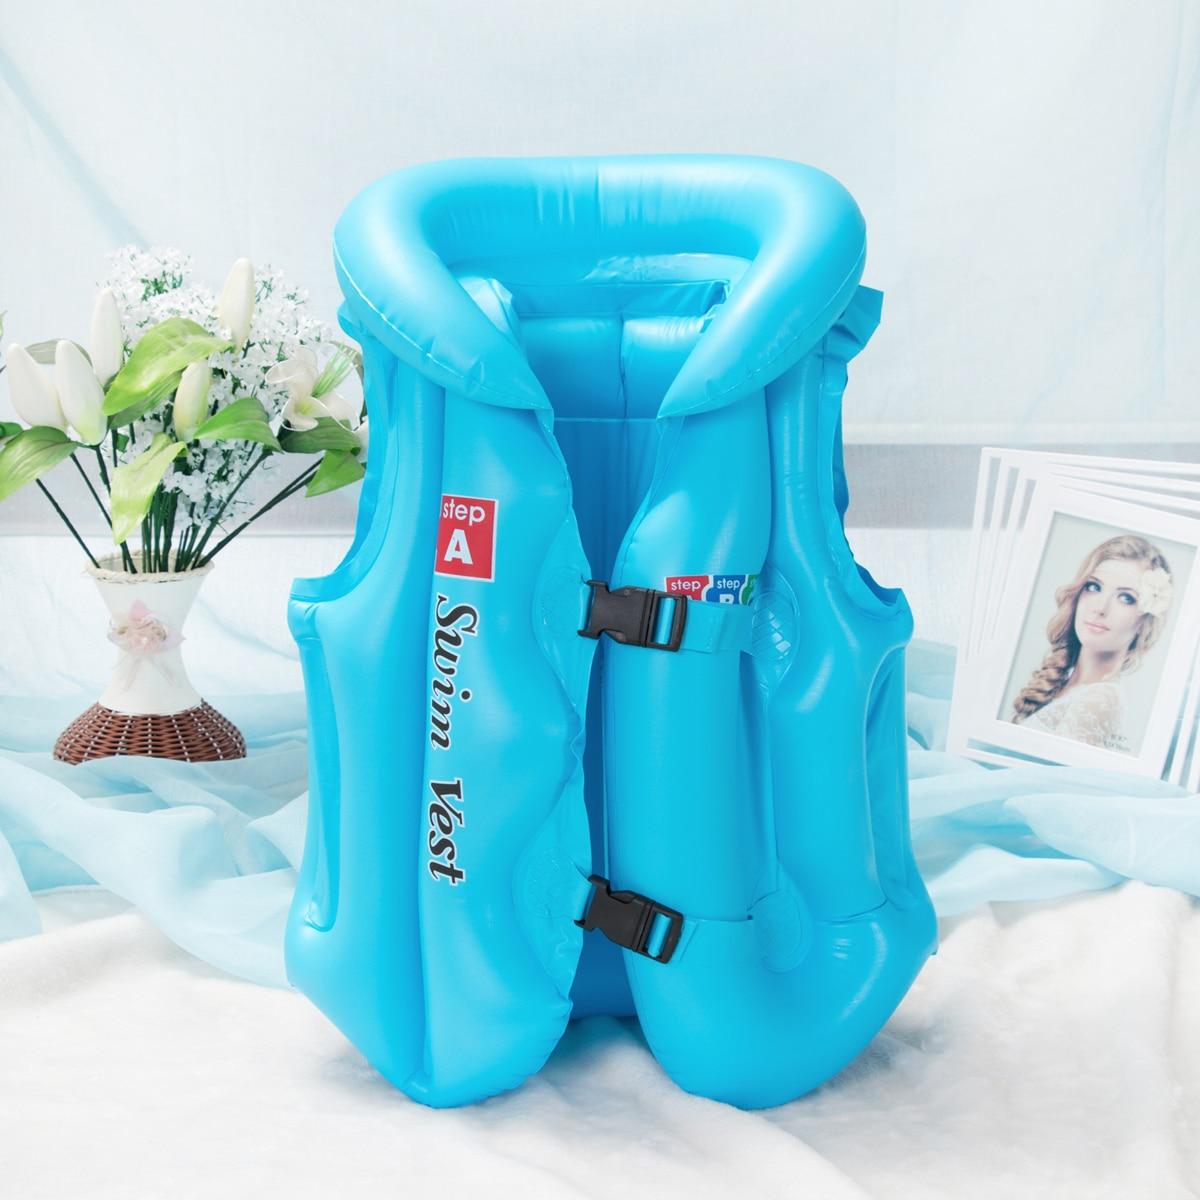 Adjustable Life Vest Swimsuit Child Inflatable Pool Float Children Kids Babies Swimming Drifting Boating Safety Jacket